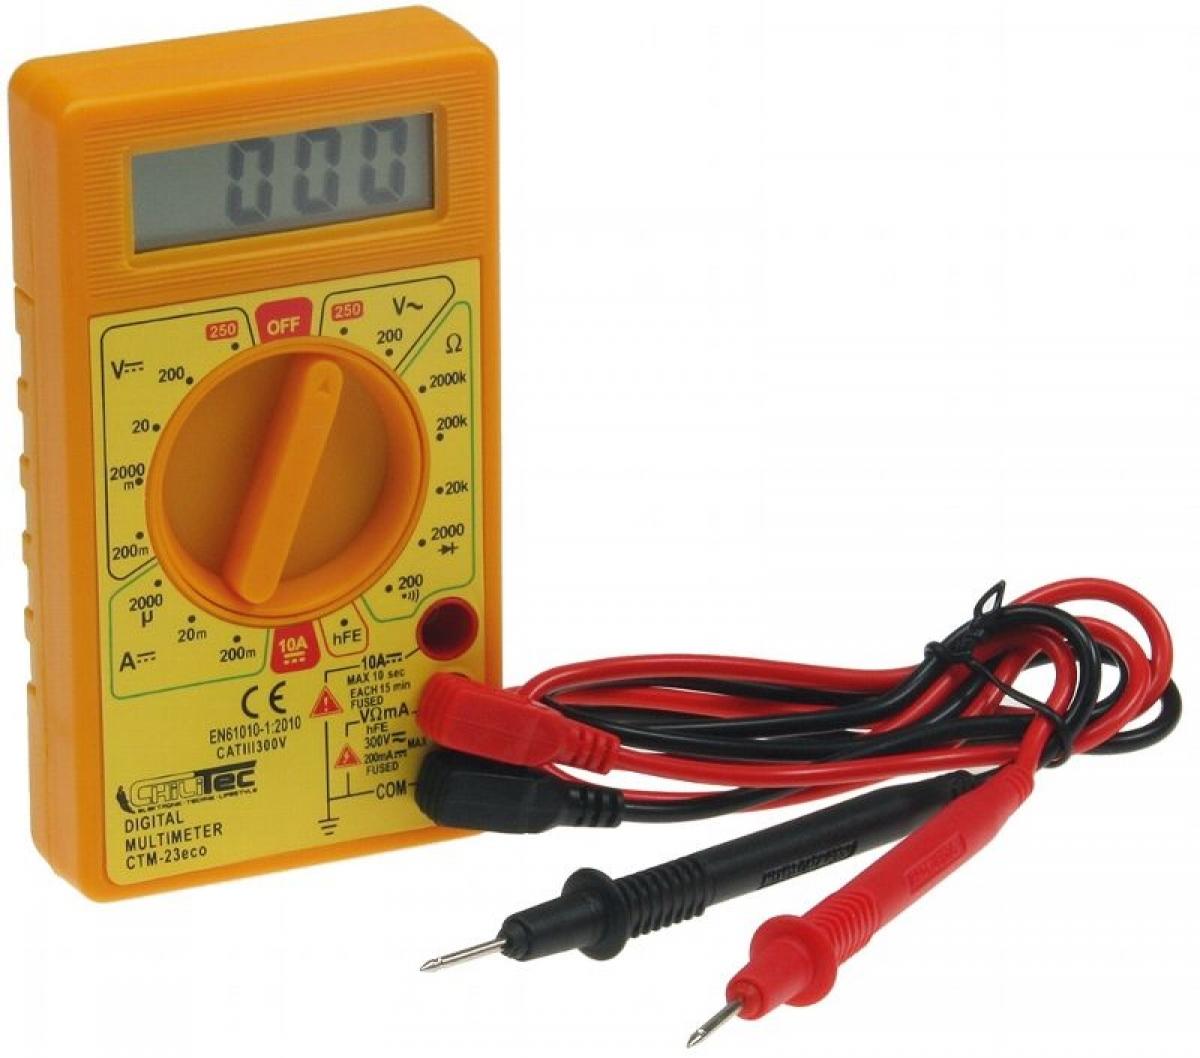 Digital Multimeter 3,5-stelliges kleines Messgerät CTM-23 eco ...